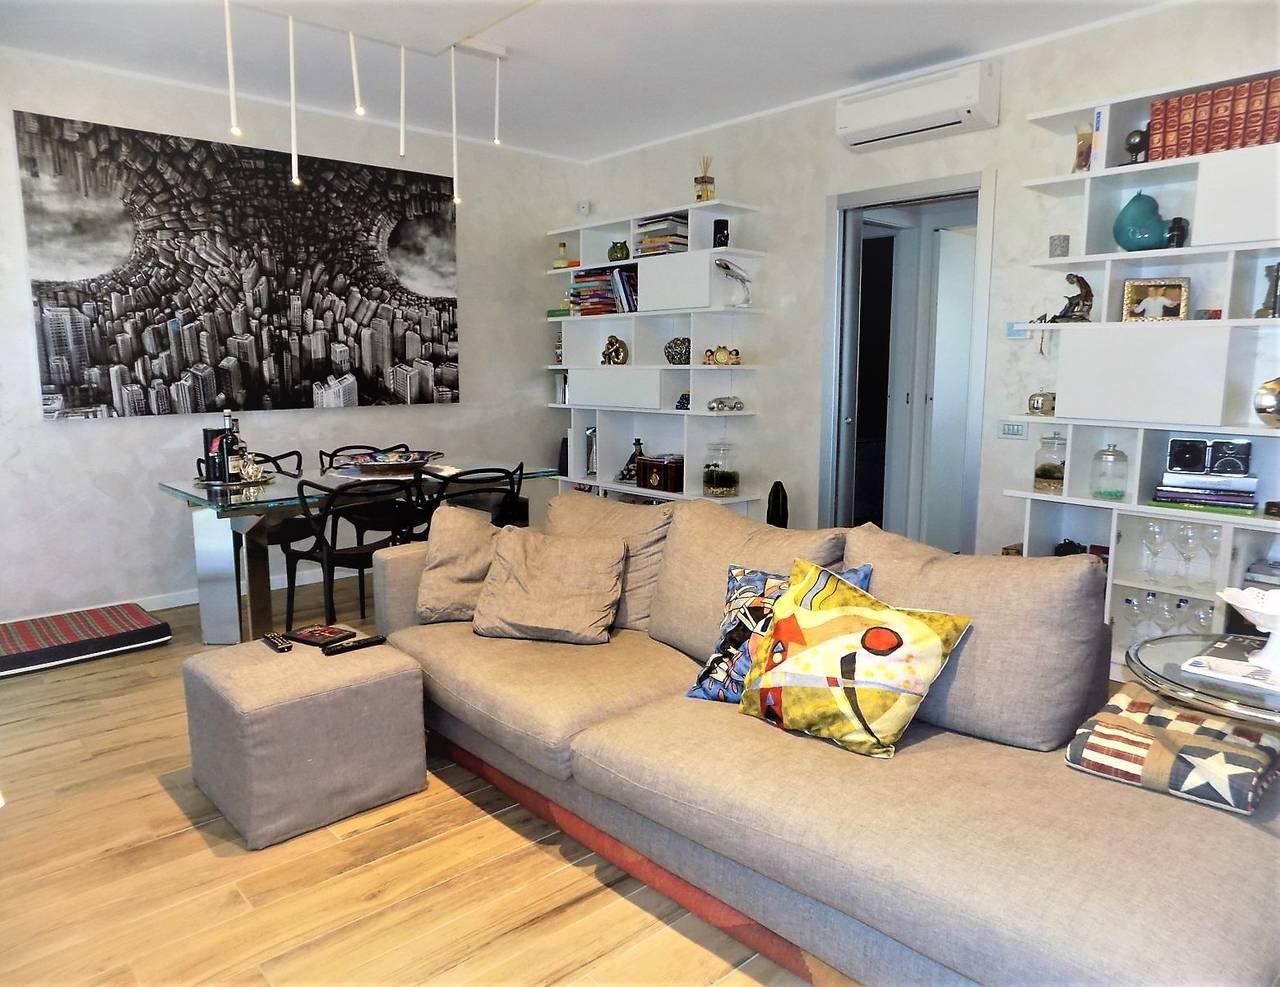 Porzione-villa-bifamigliare-ristrutturata-in-vendita-a-Carnate-5